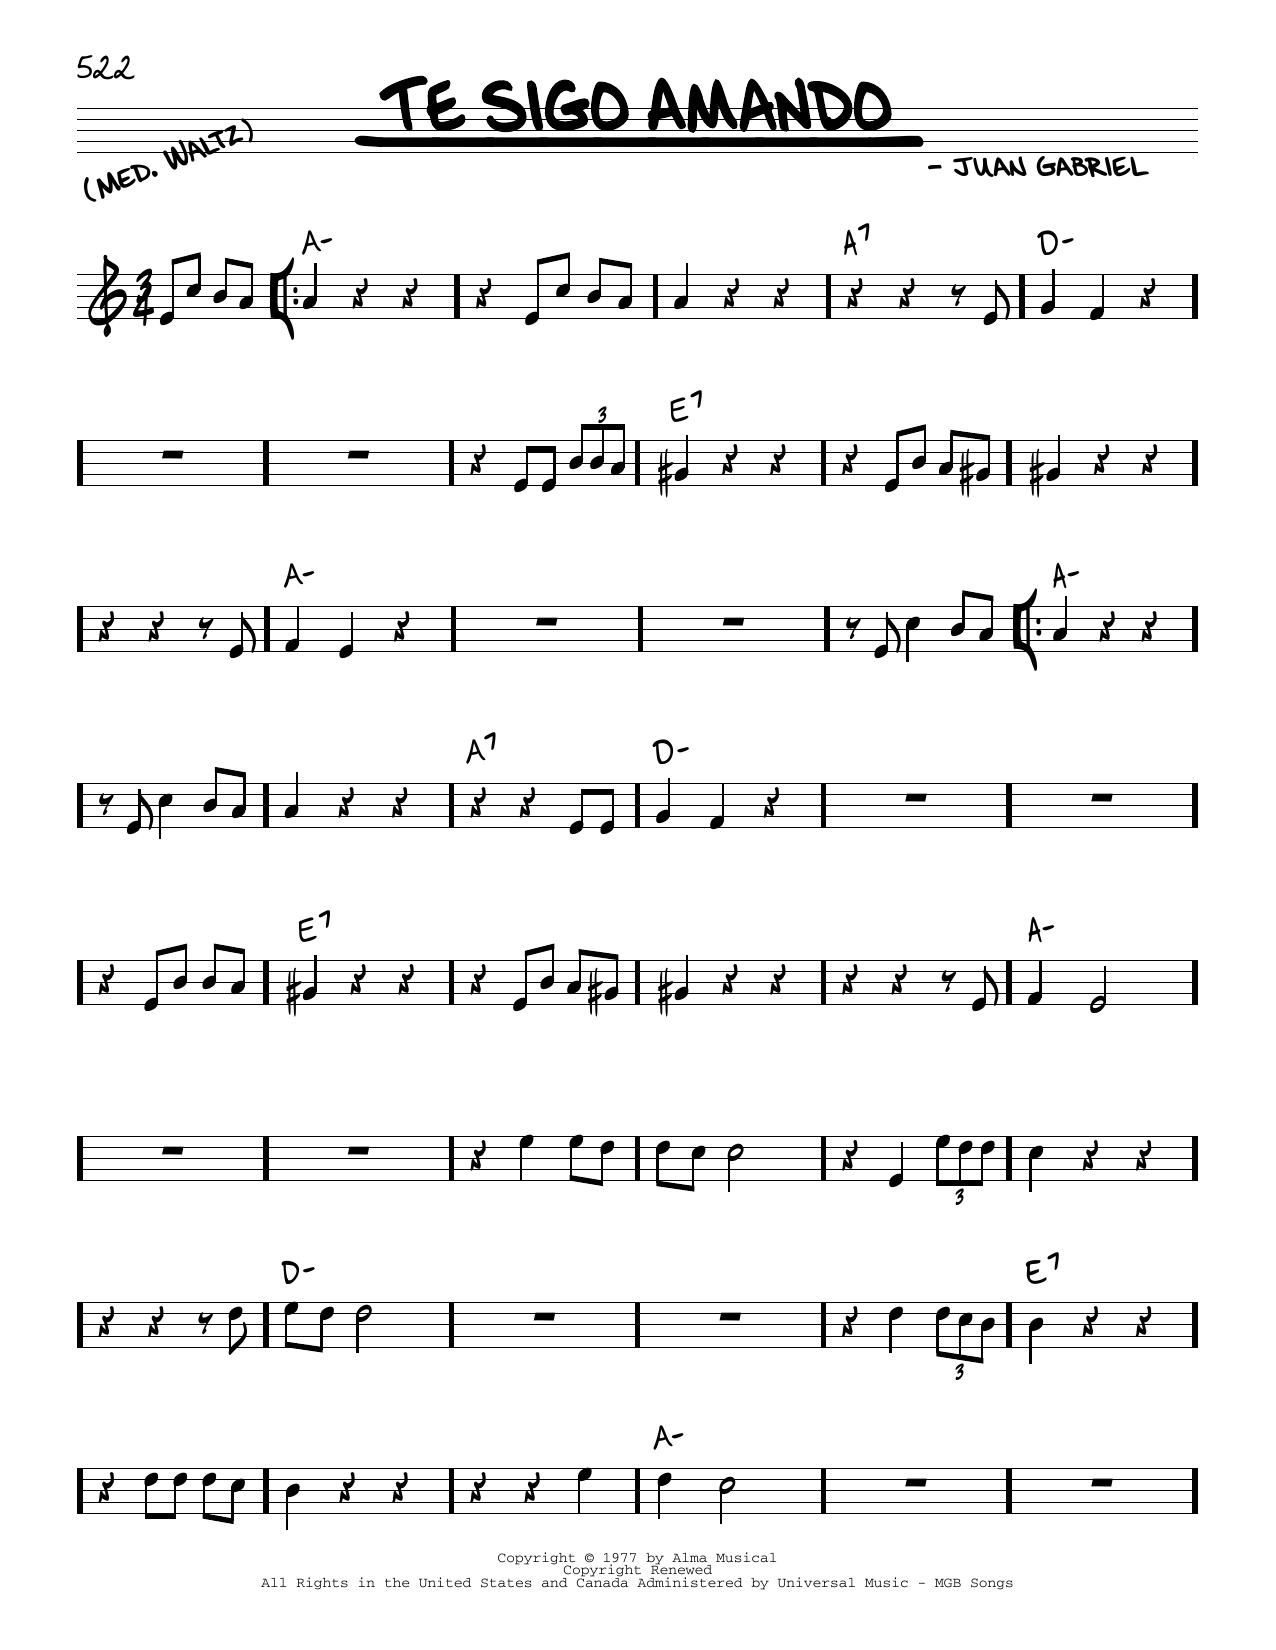 Juan Gabriel Te sigo Amando sheet music notes and chords. Download Printable PDF.